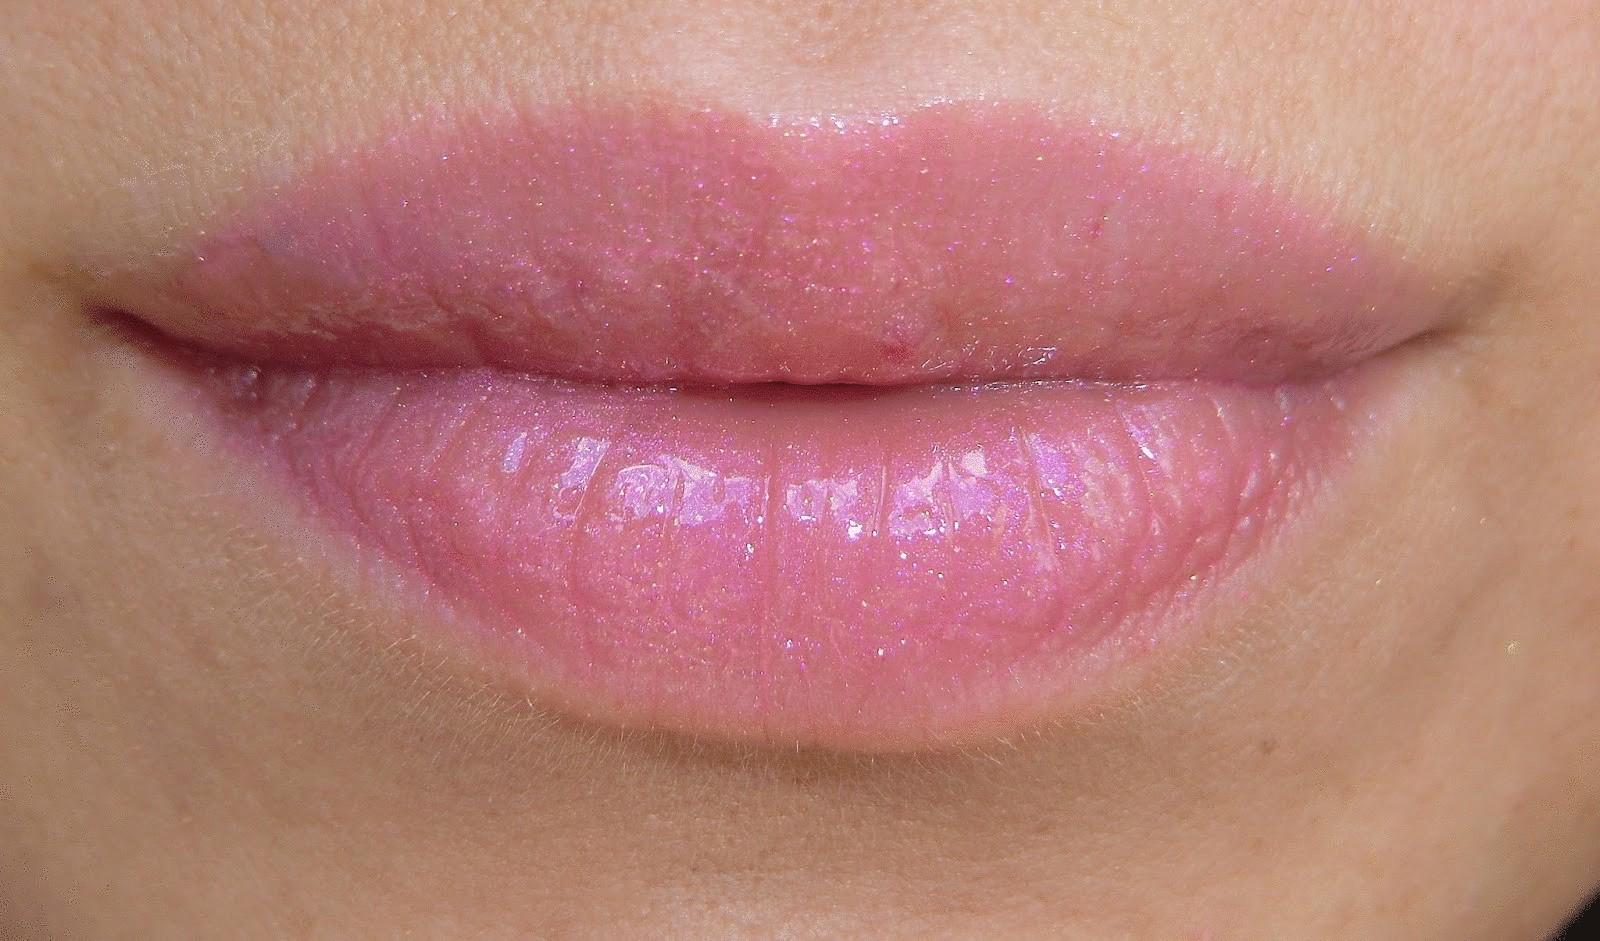 аллергия на помаду признаки